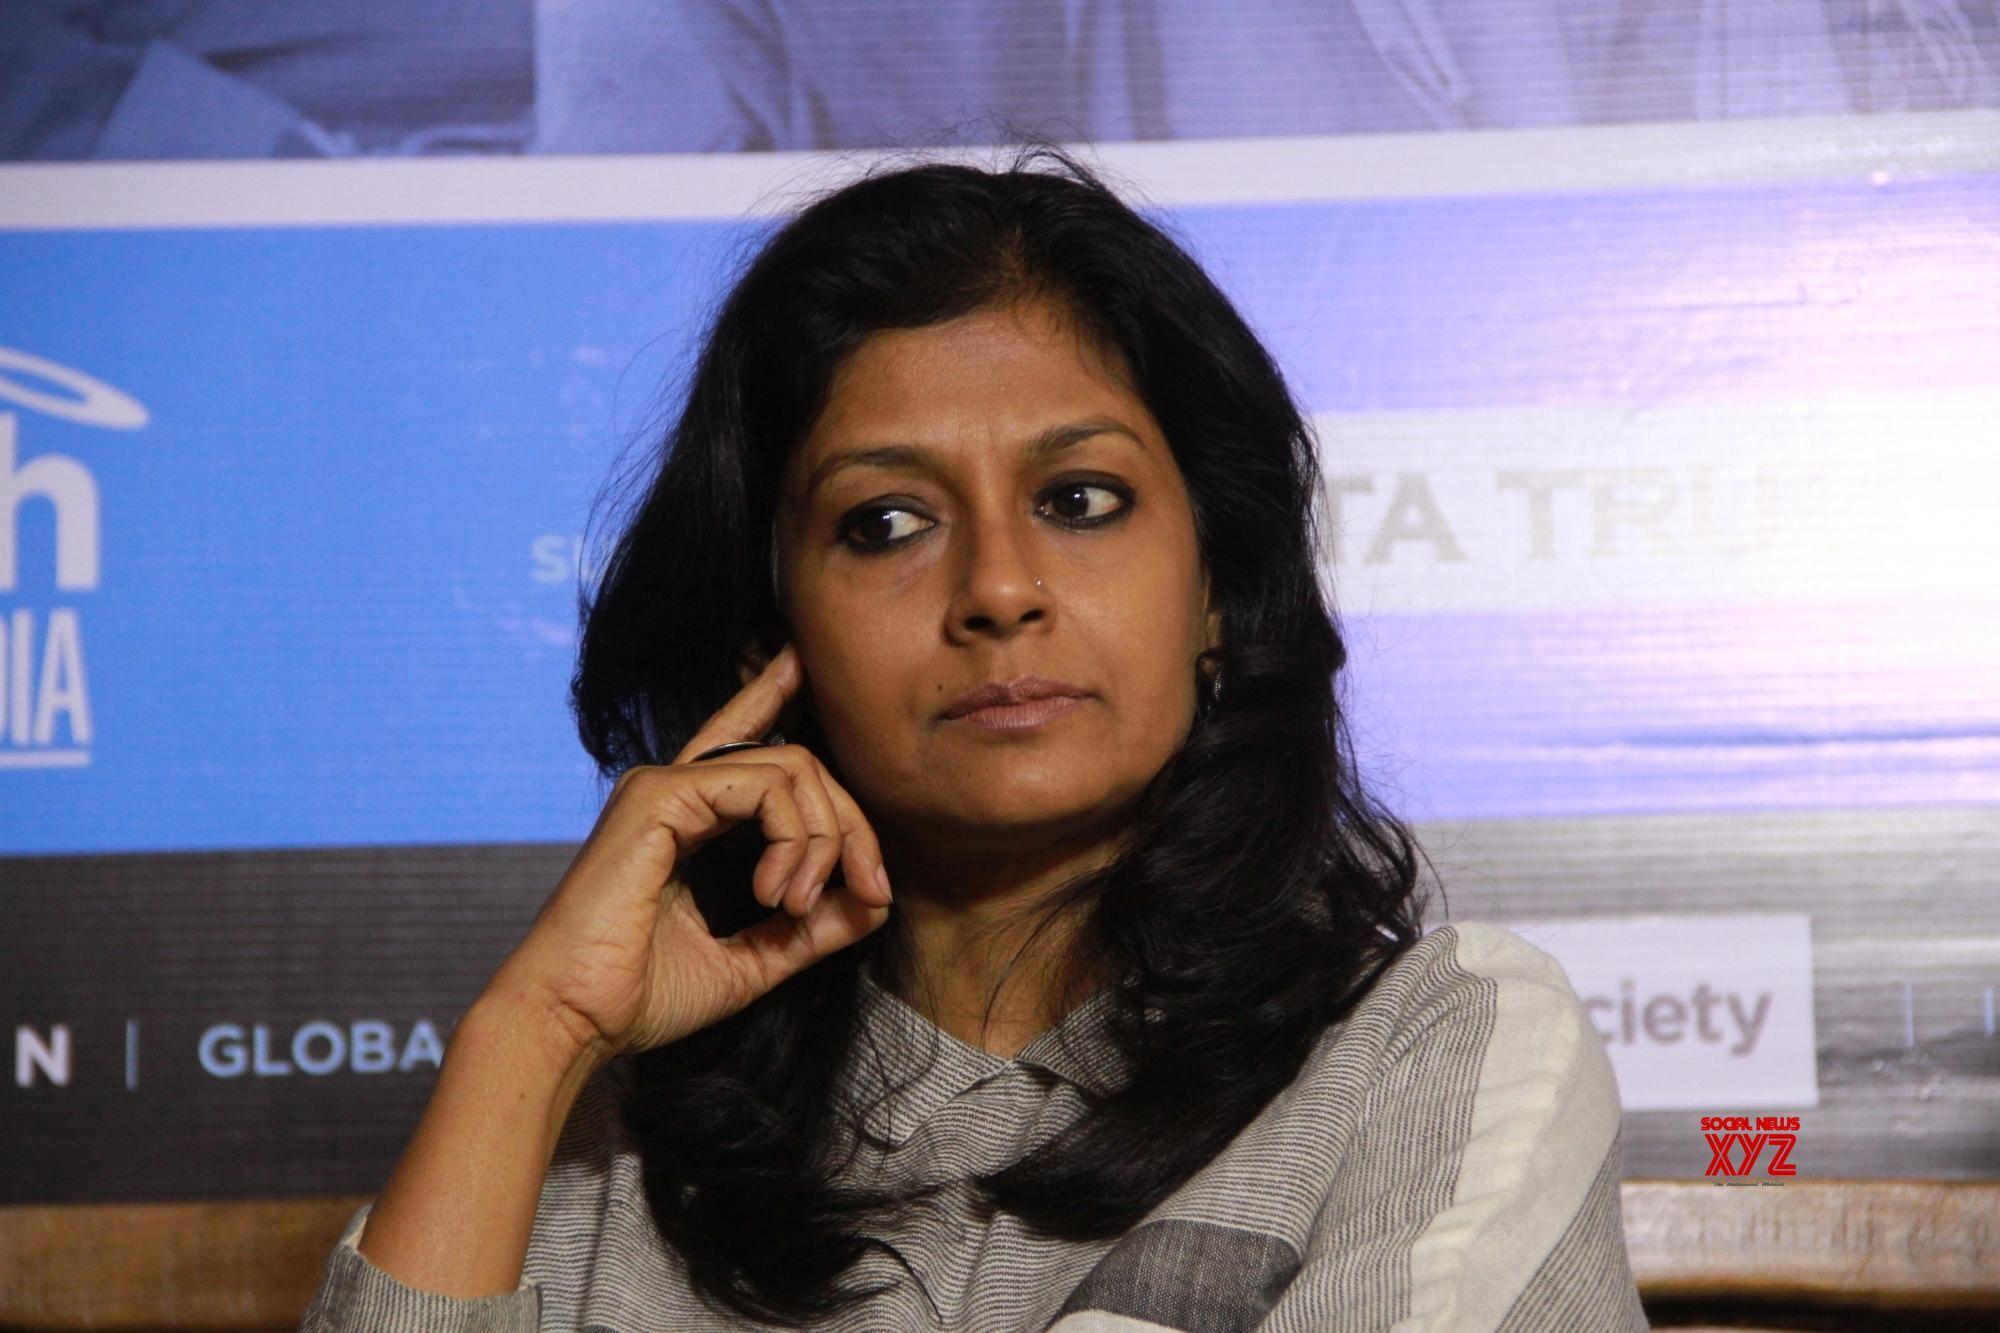 That 'Manto' got made is a miracle: Nandita Das